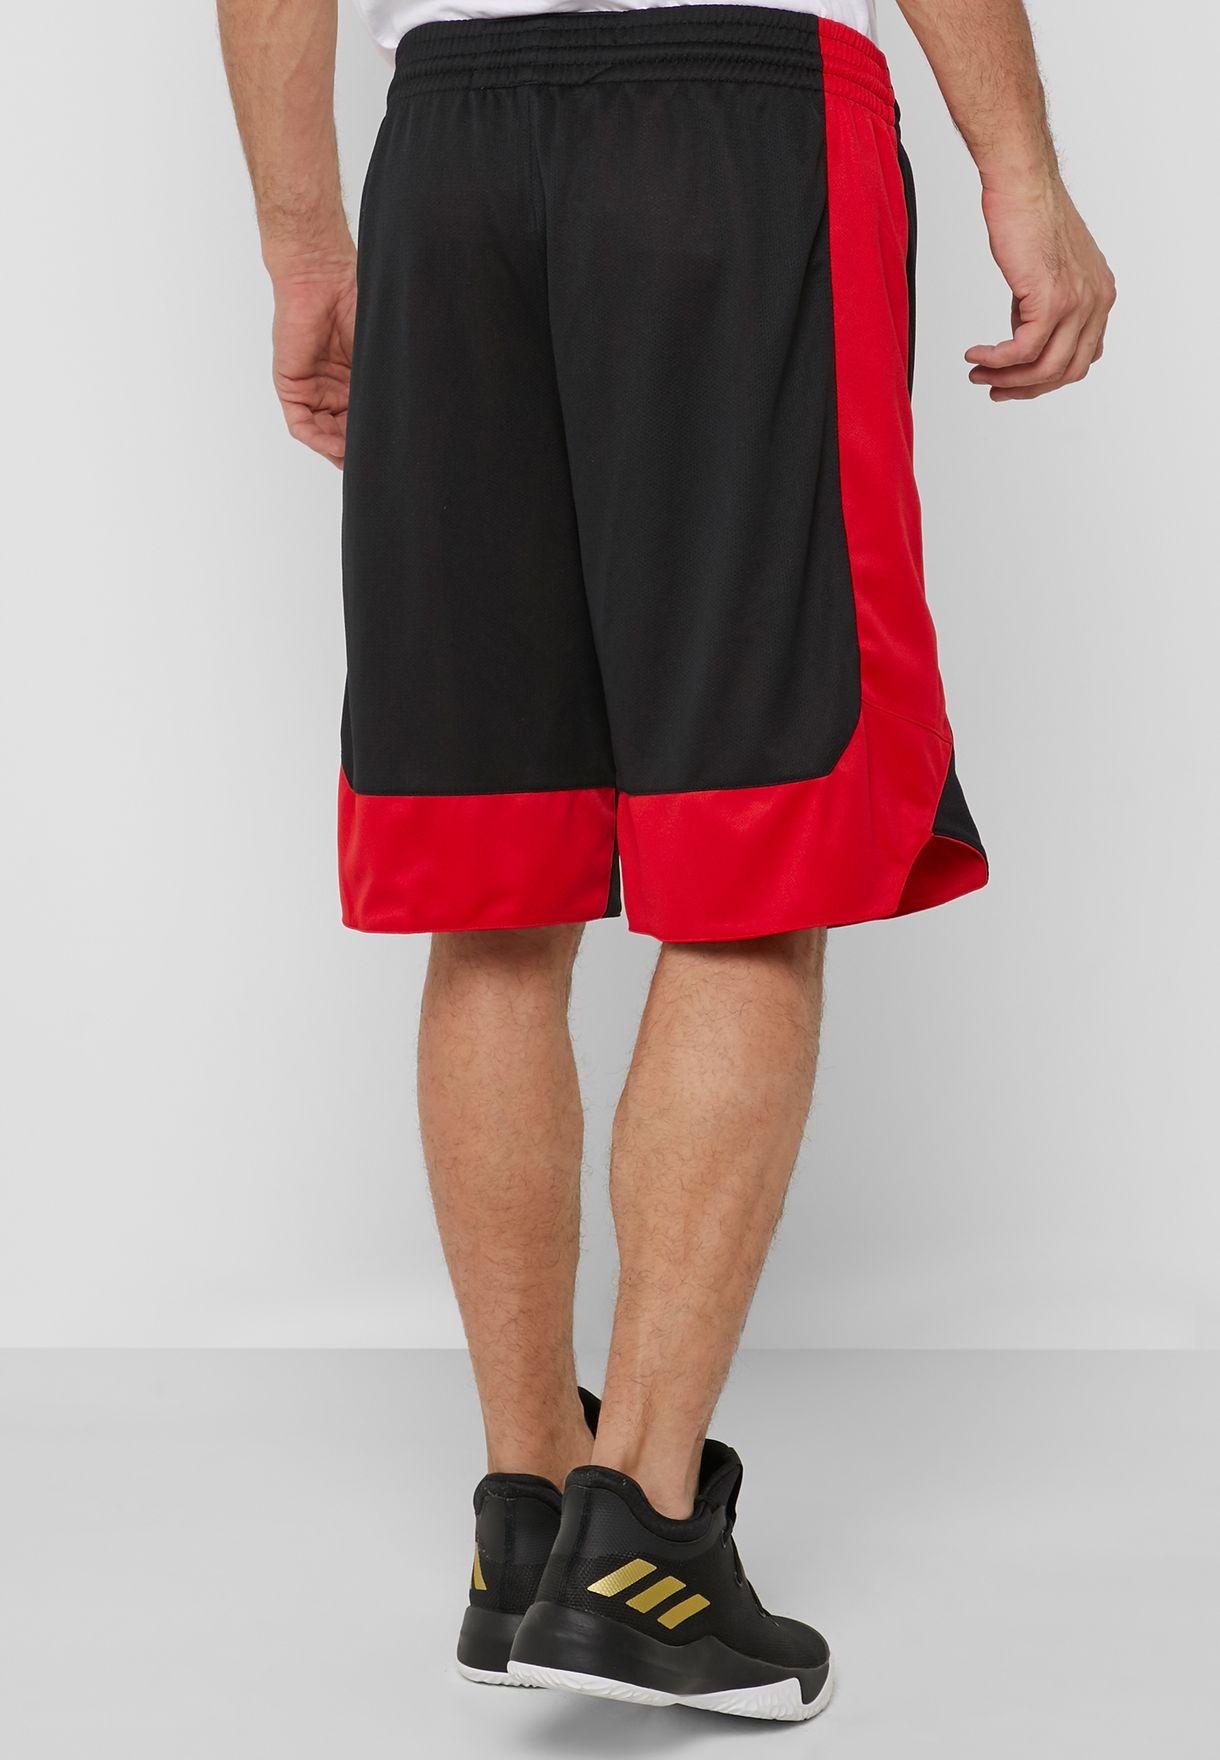 Reversible Crazy Explosive Shorts